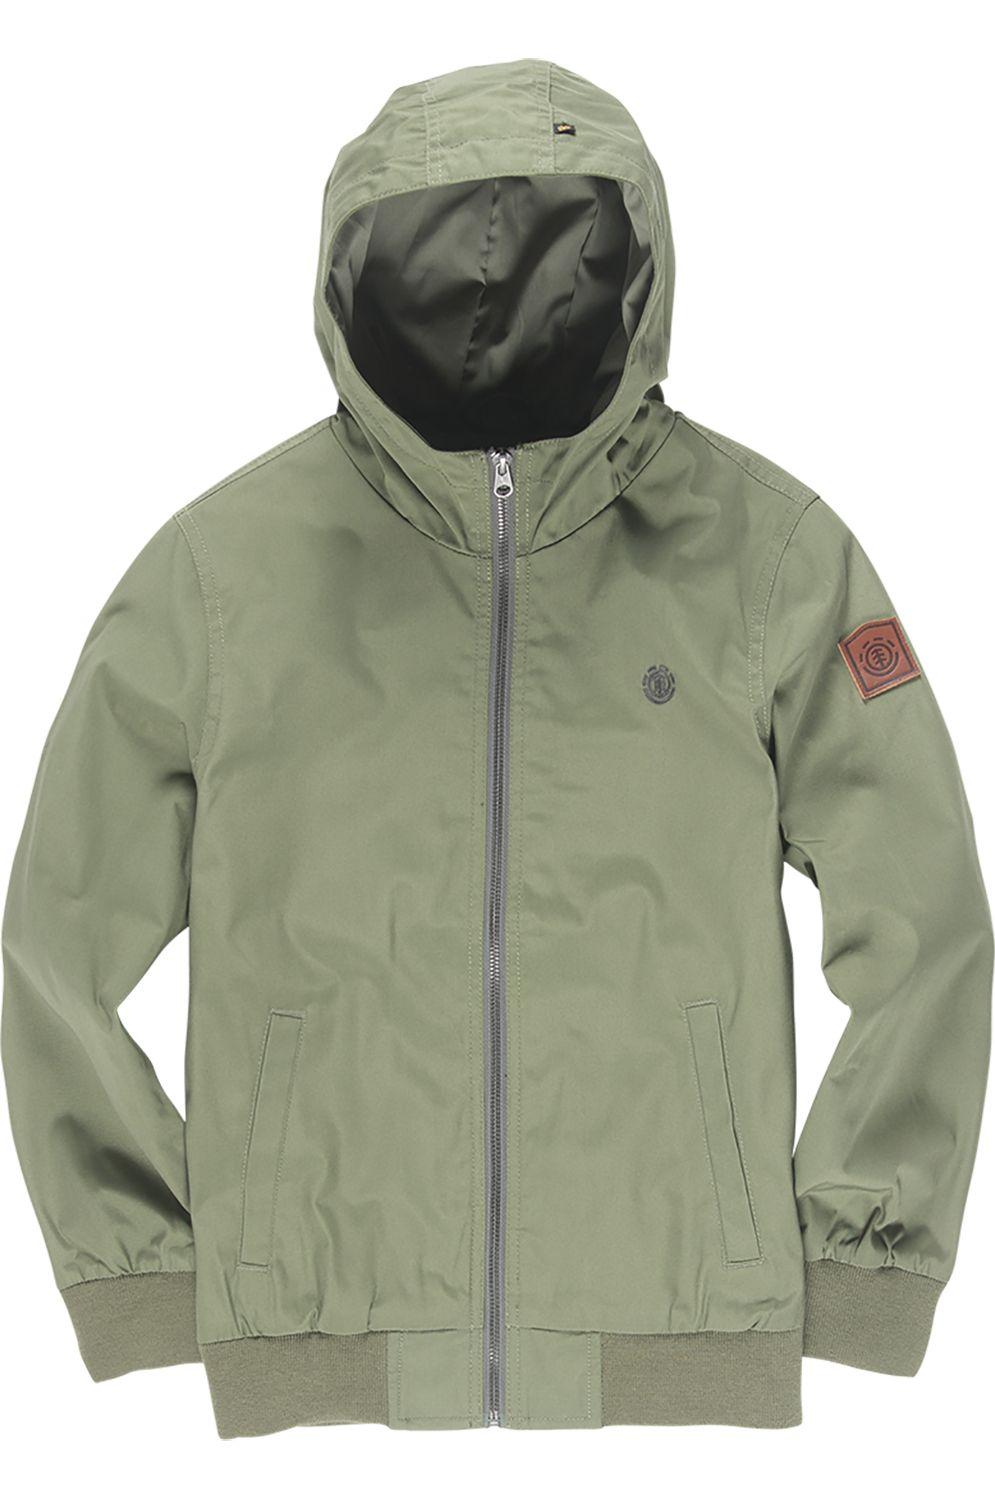 Element Jacket DULCEY LIGHT FOUNDATION Surplus